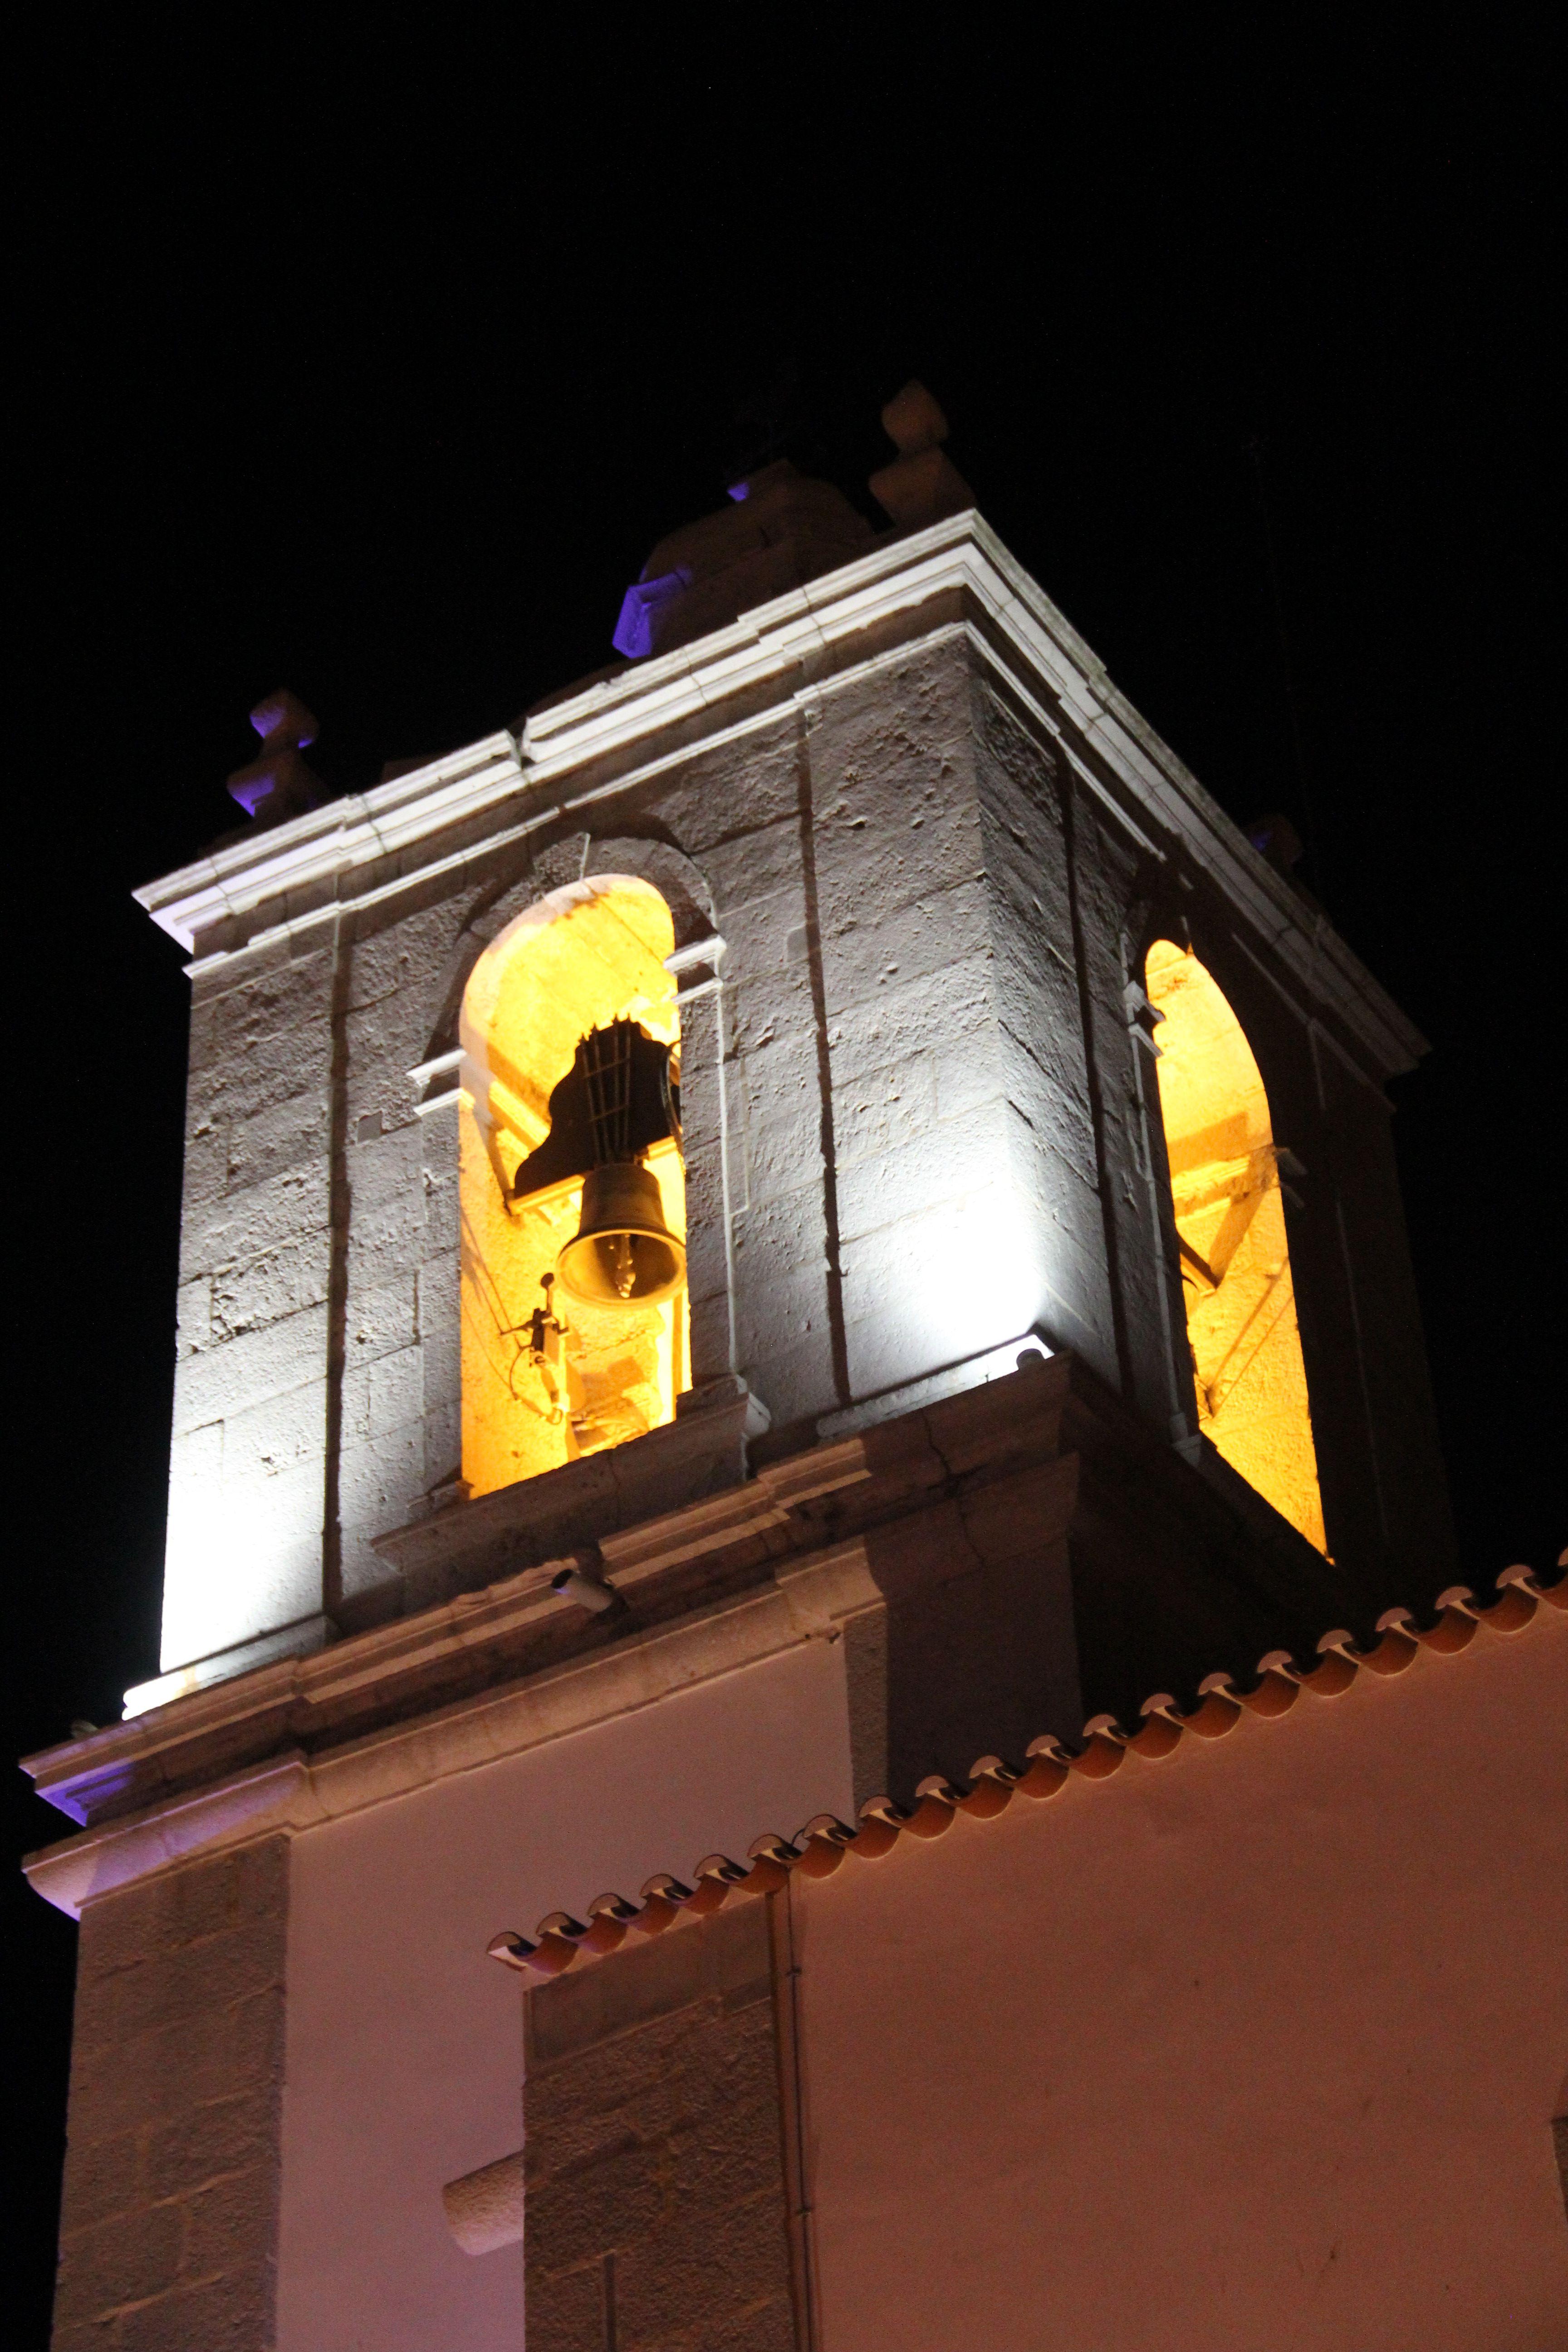 Igreja Santa Casa da Misericórdia de Peniche, Peniche, jul 2016